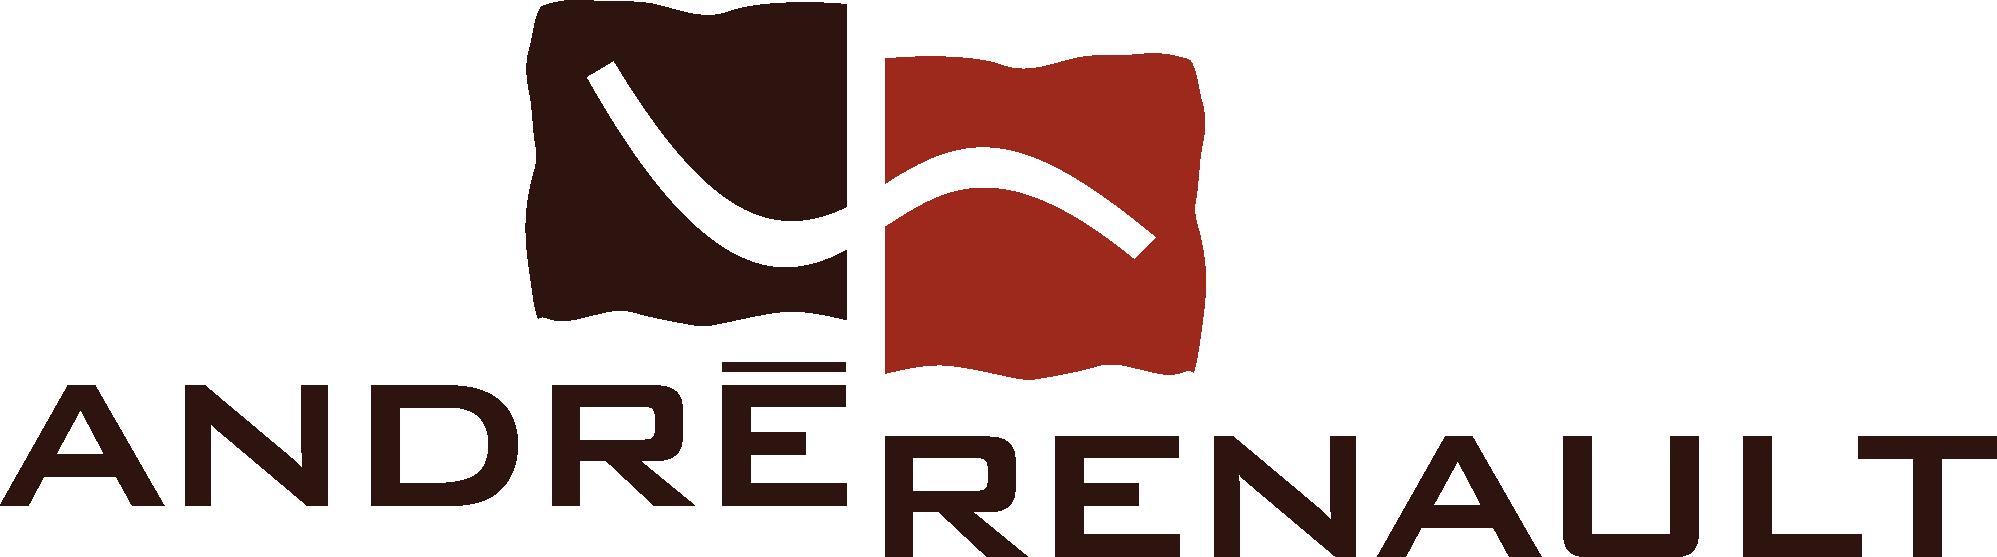 527-andre-renault_logo_quadri.png